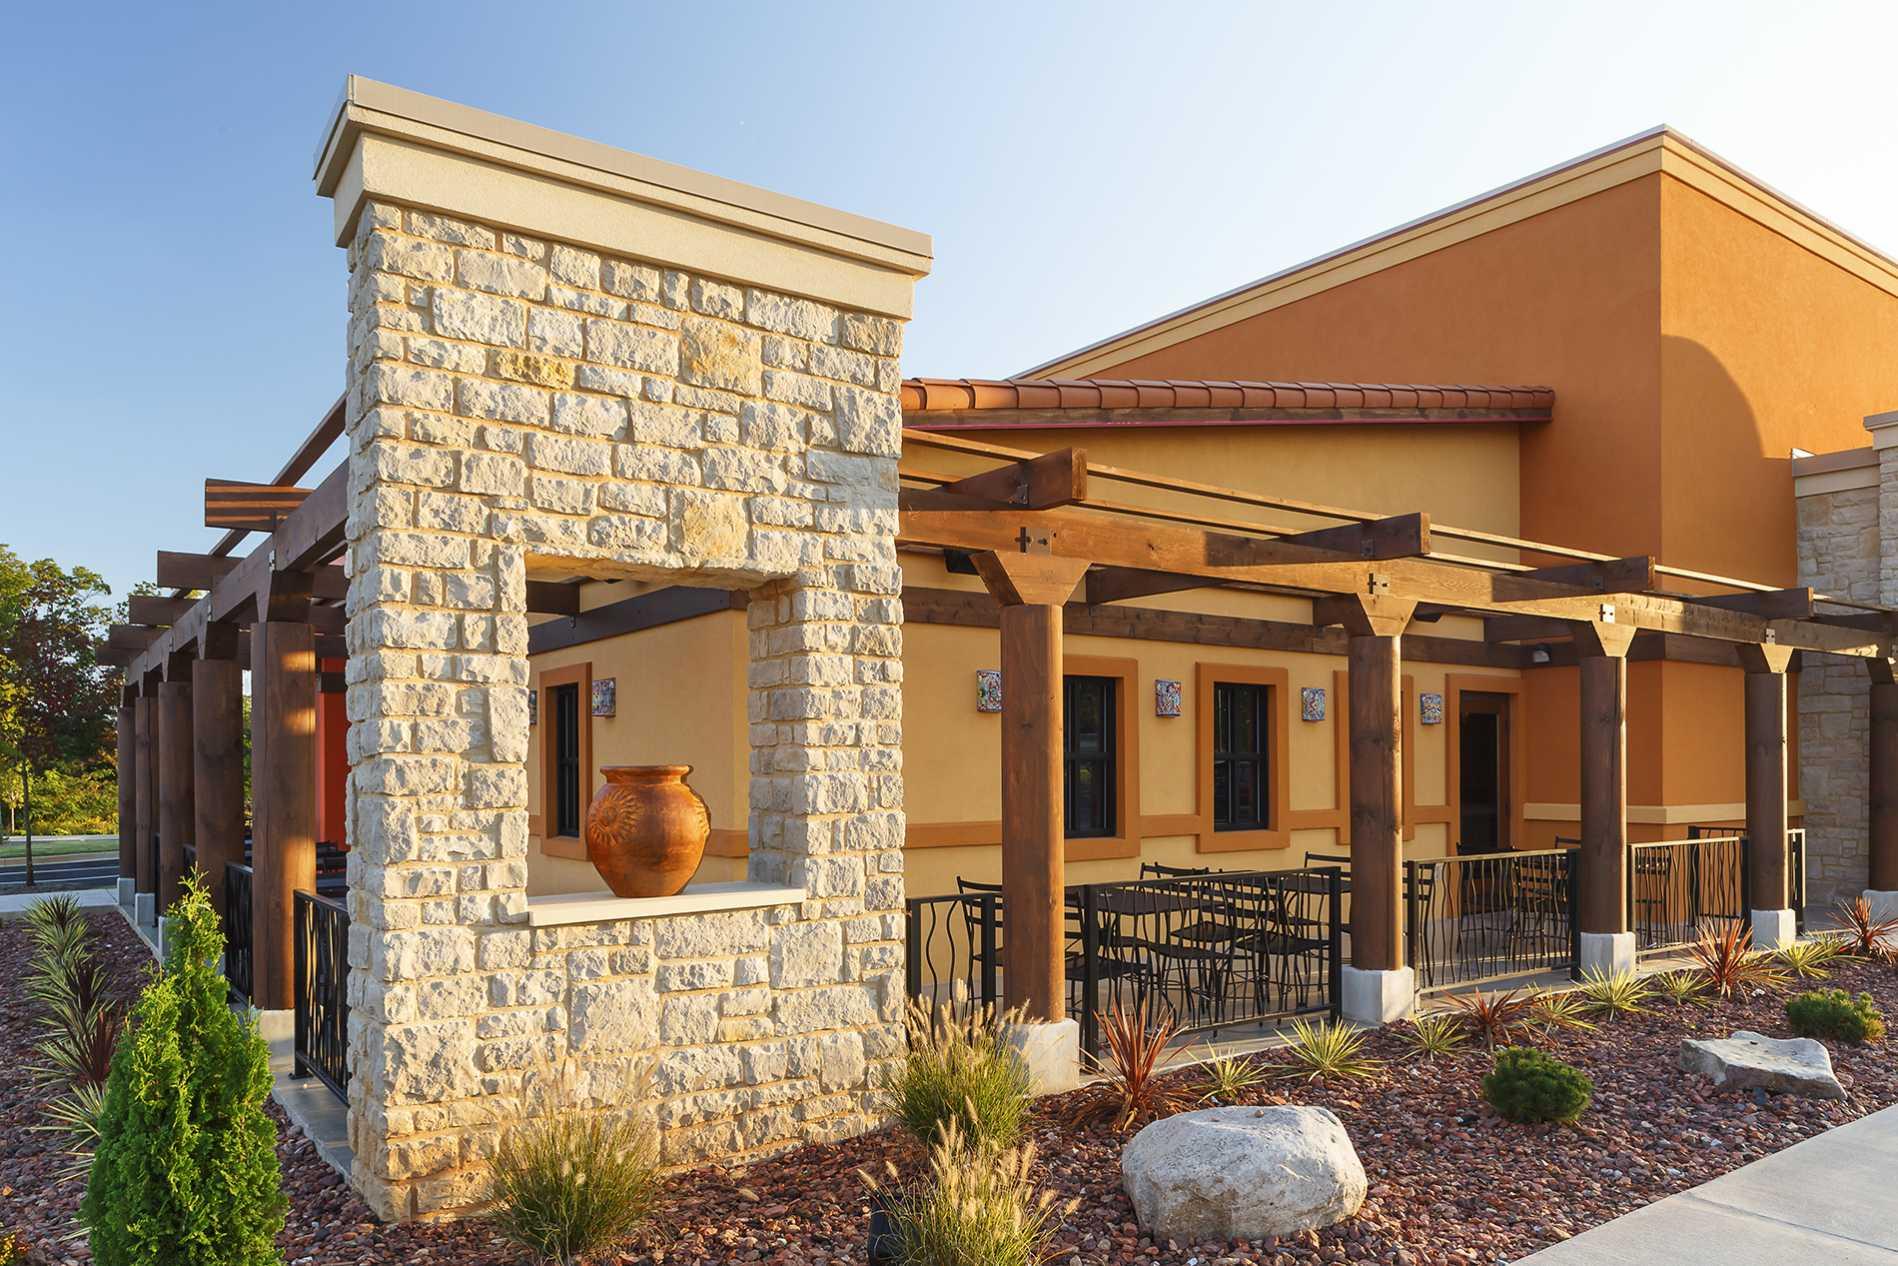 Restaurant Design Firm | Contact the Restaurant Design ...